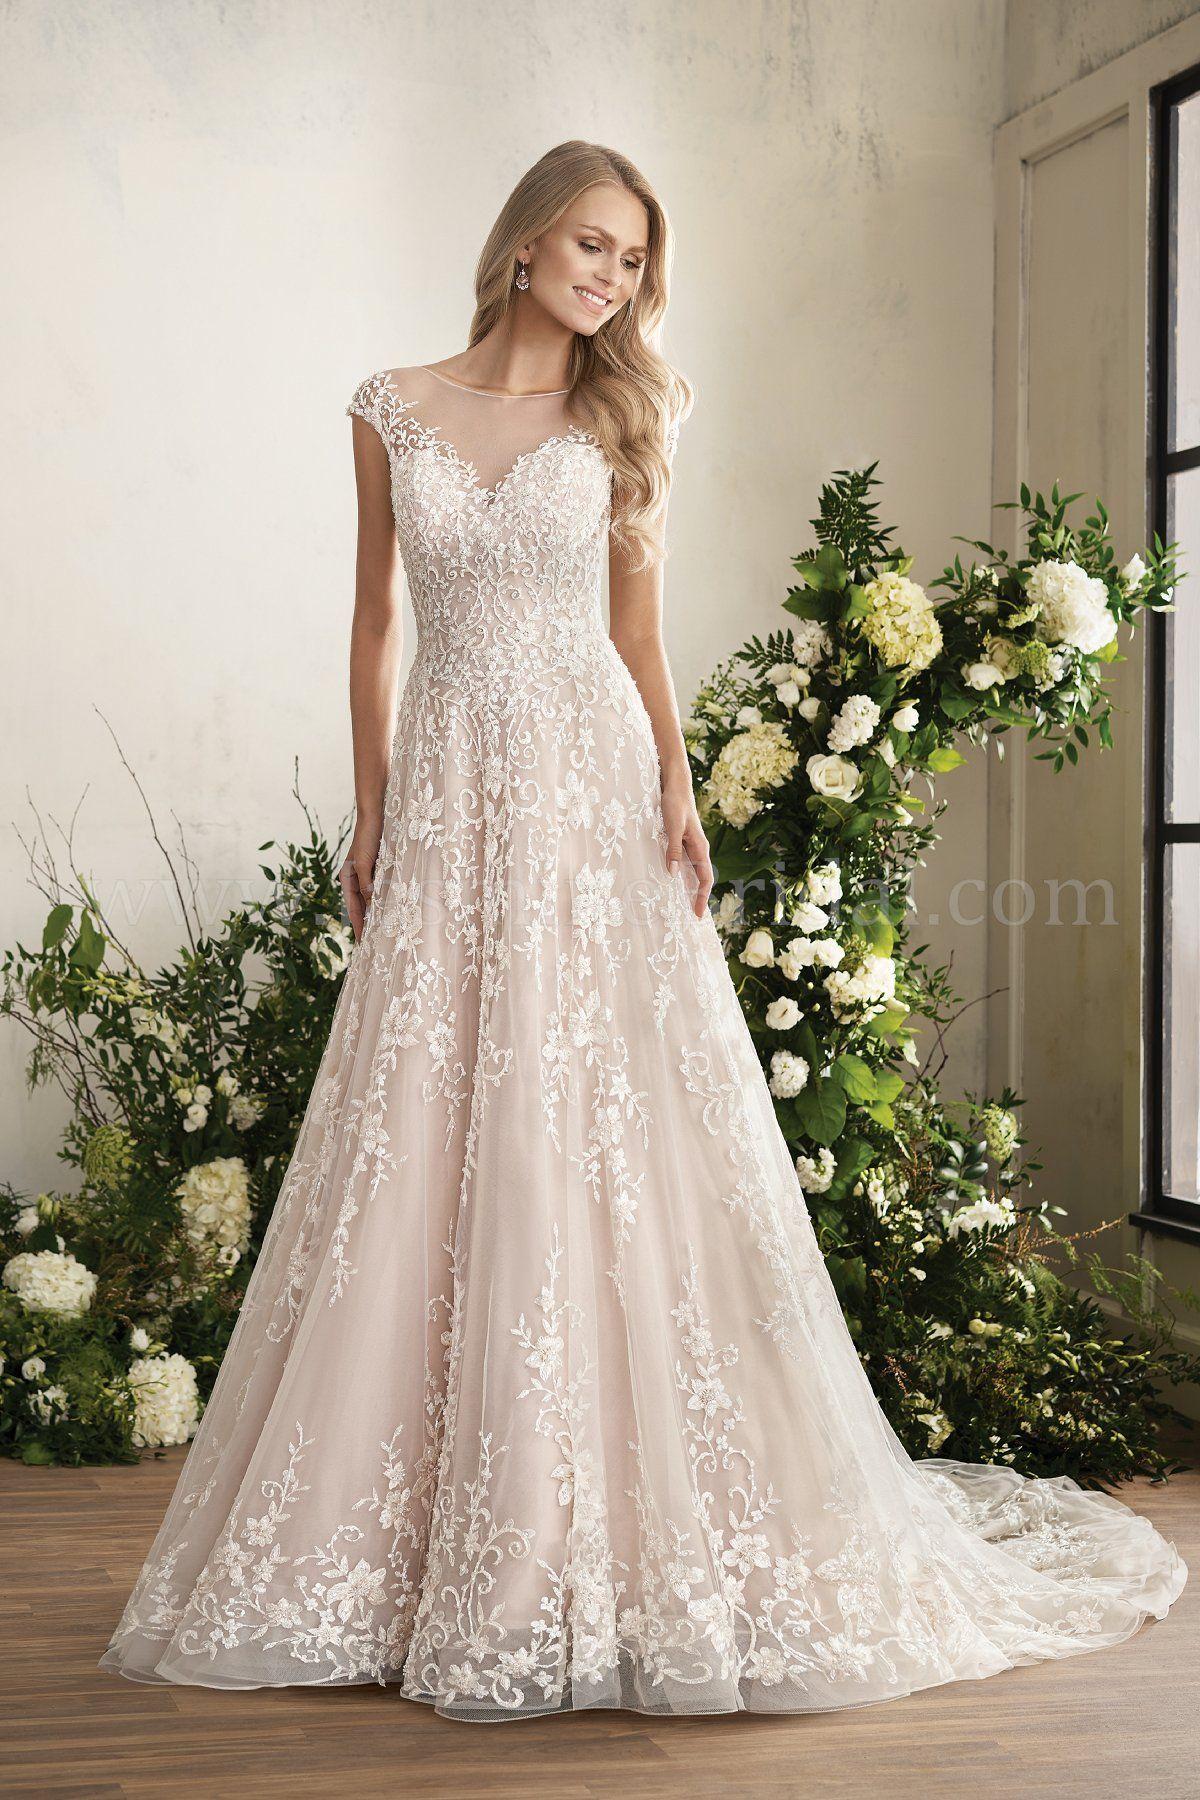 Jasmine Bridal Disney Wedding Dresses Wedding Dress Guide Bridal Dresses [ 1800 x 1200 Pixel ]